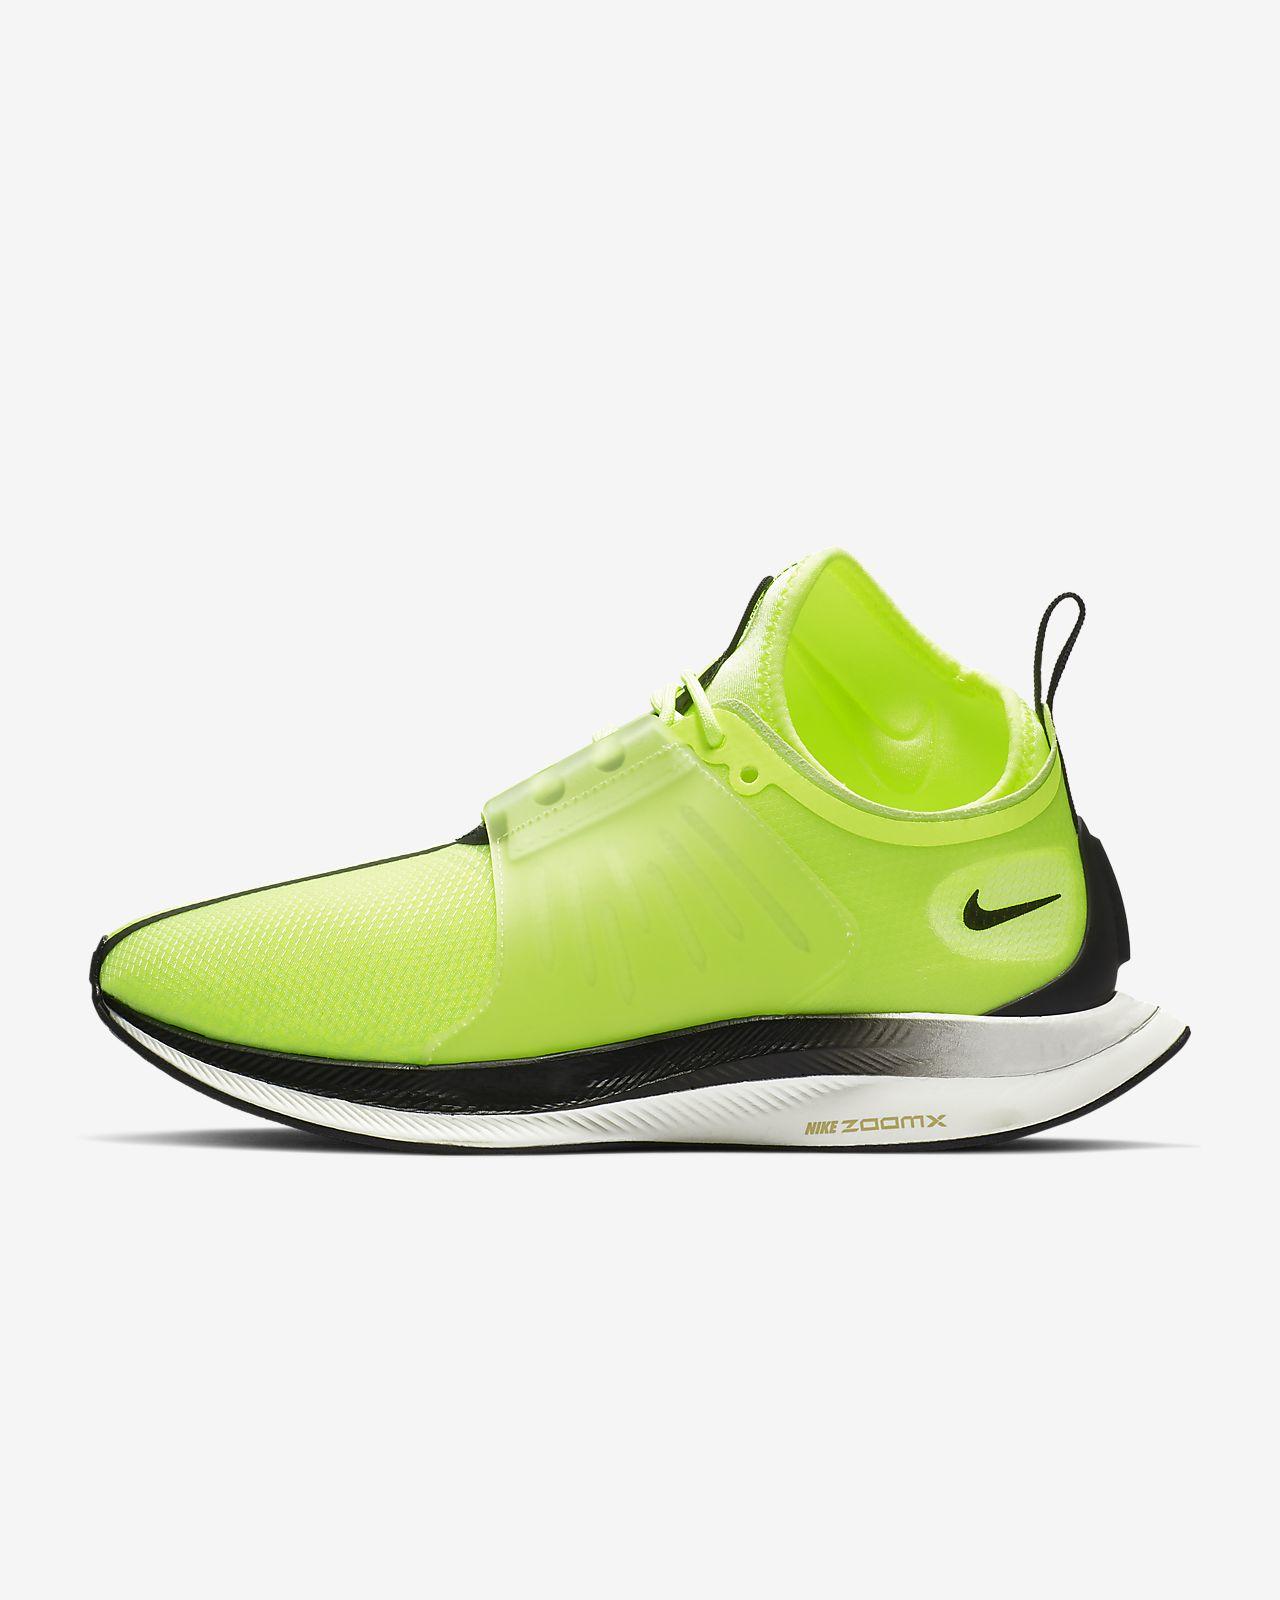 cheap for discount 37101 c5088 ... Löparsko Nike Zoom Pegasus Turbo XX för kvinnor